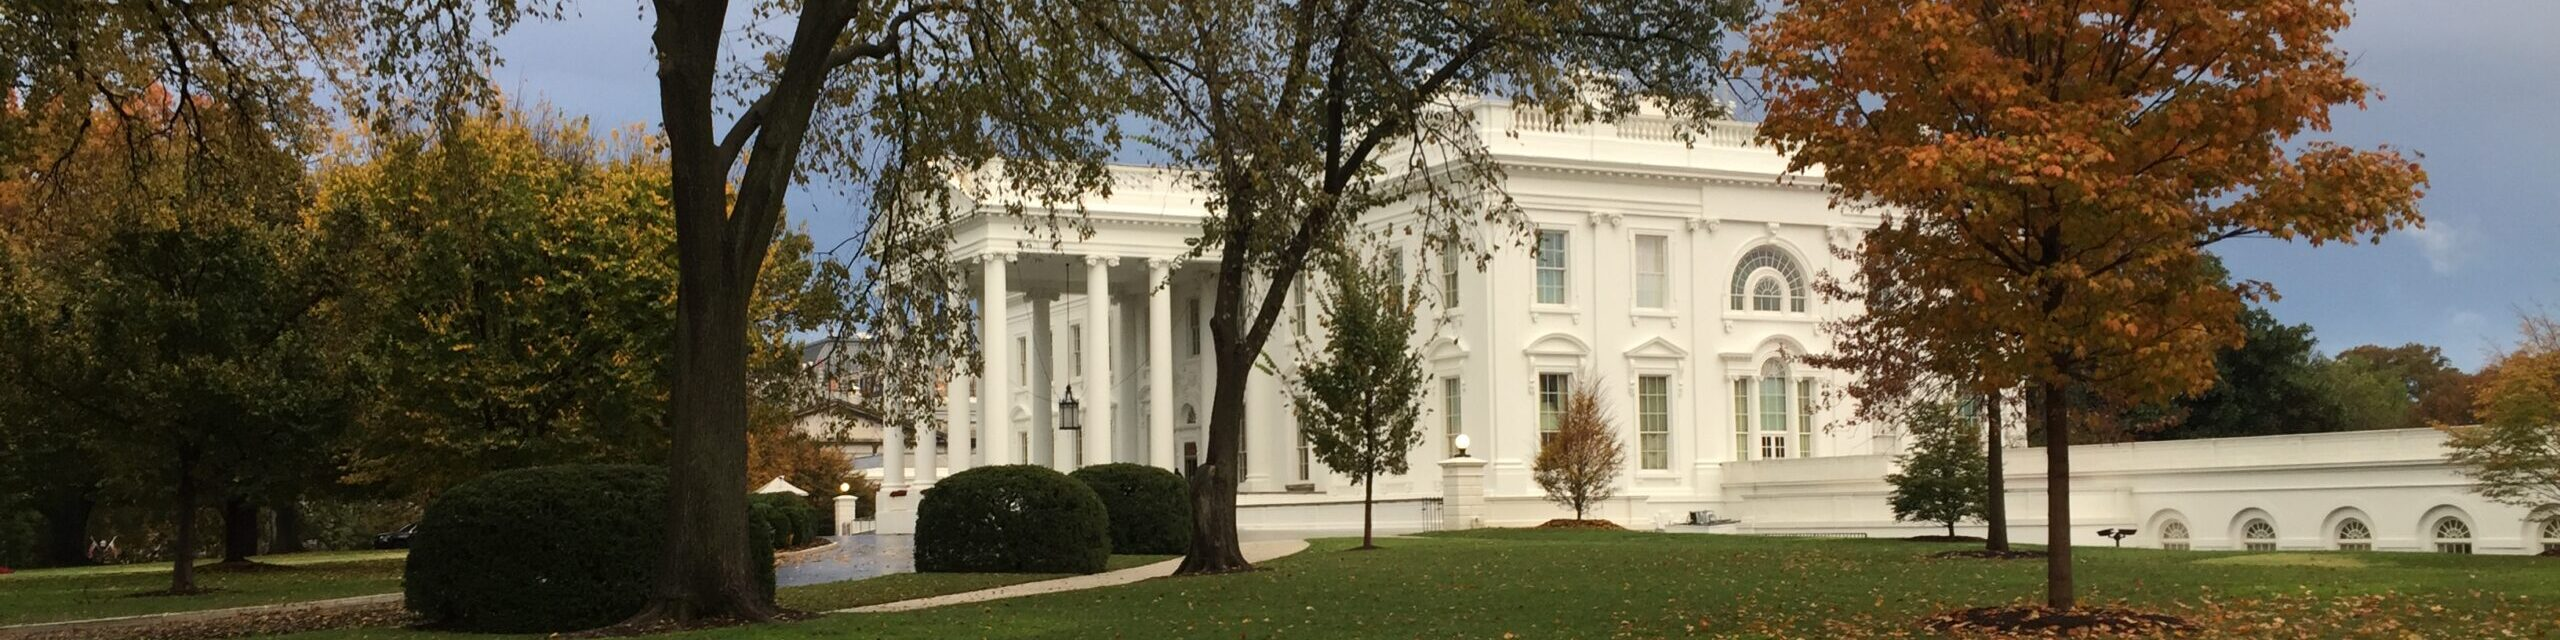 The White House Blogger